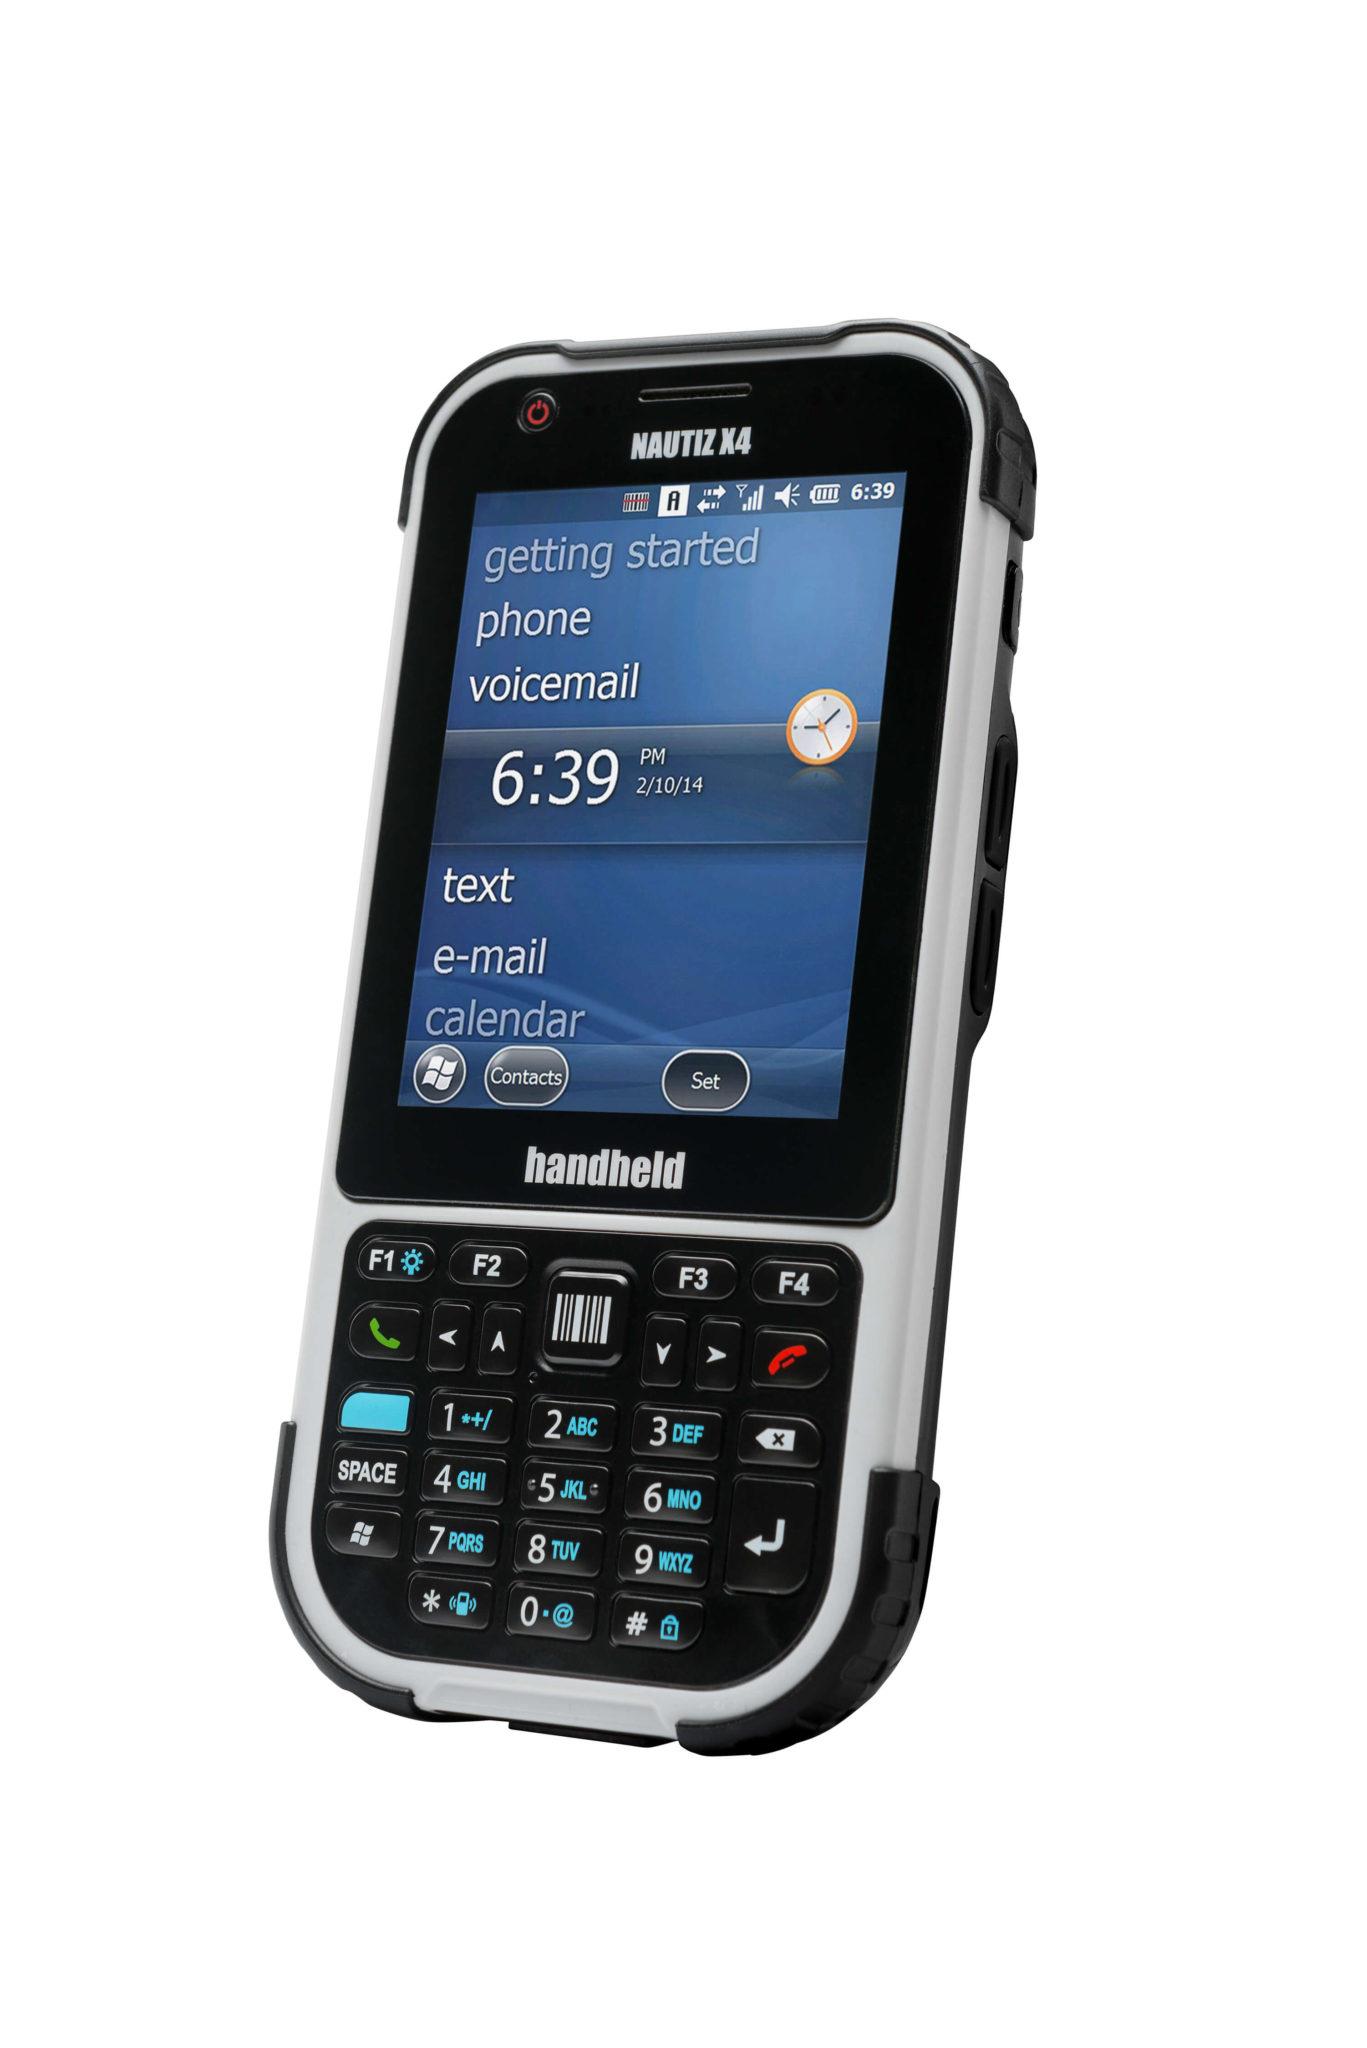 nautiz-eticket-pro-ii-handheld-rugged-facing-left